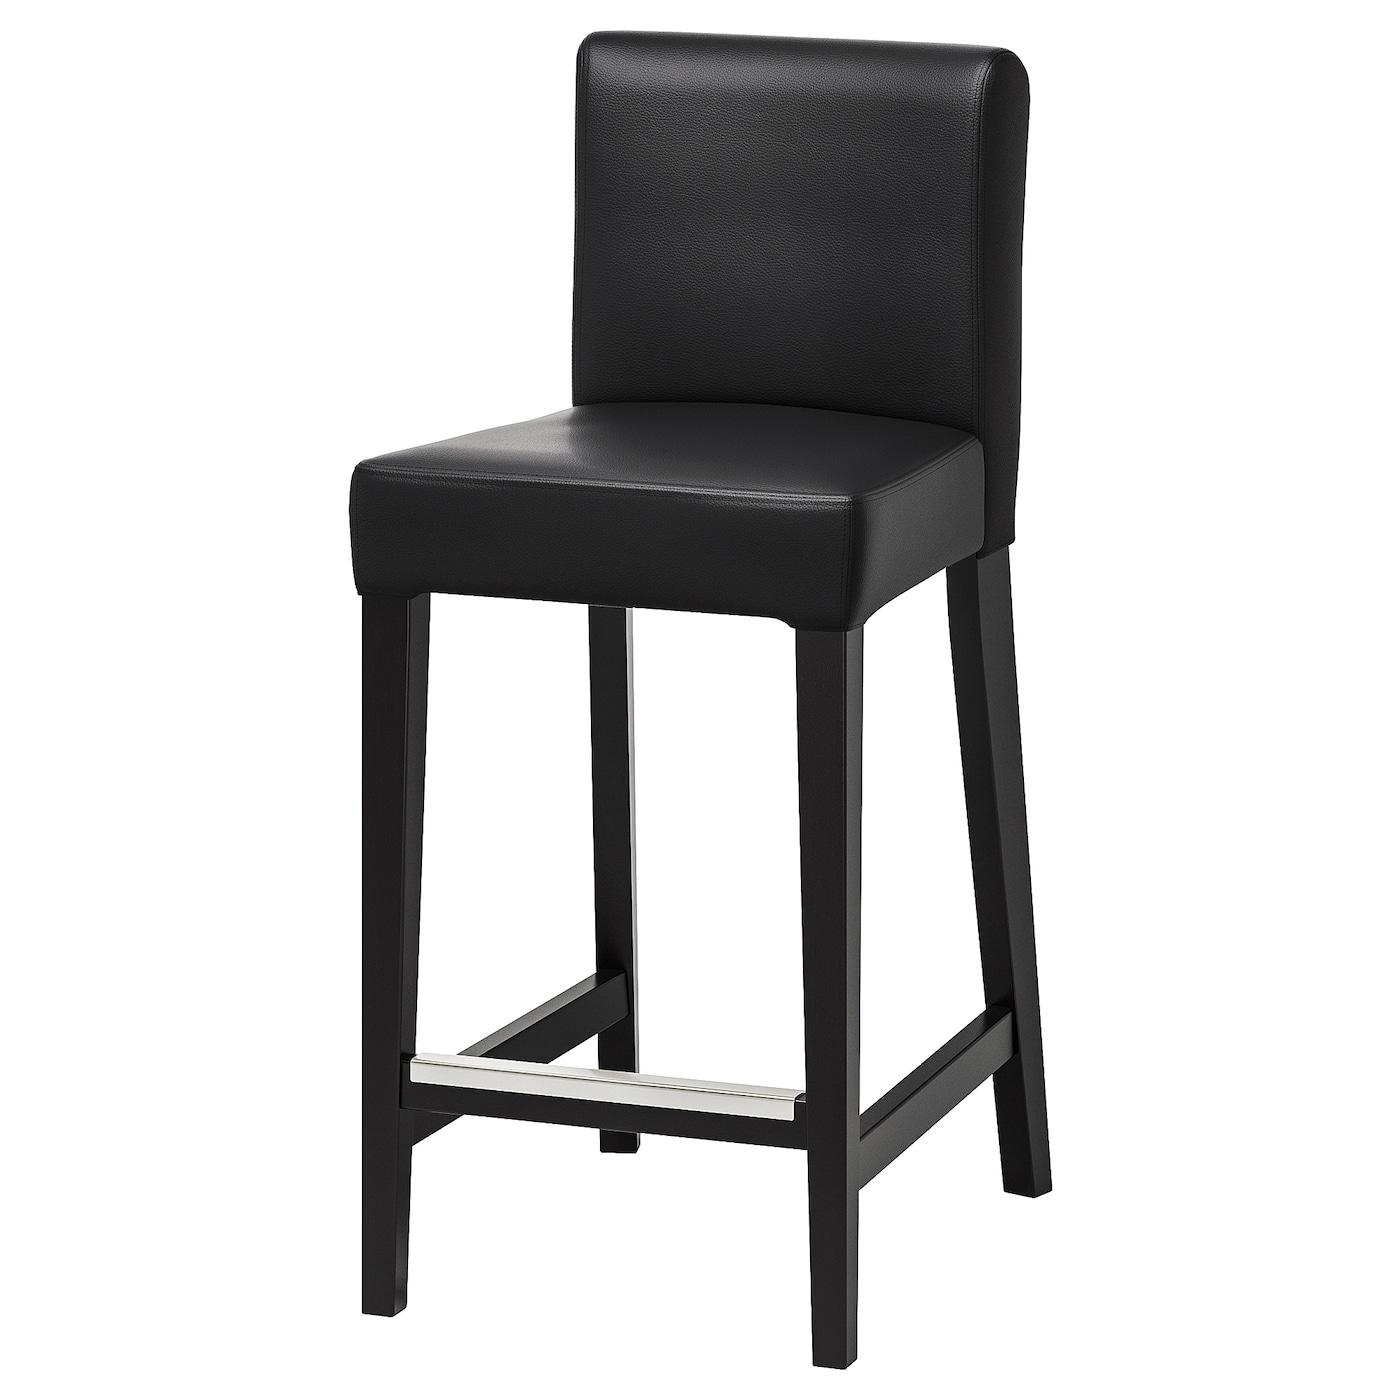 Henriksdal Bar Stool With Backrest Brown Black Glose Black Width 18 1 2 Find It Here Ikea